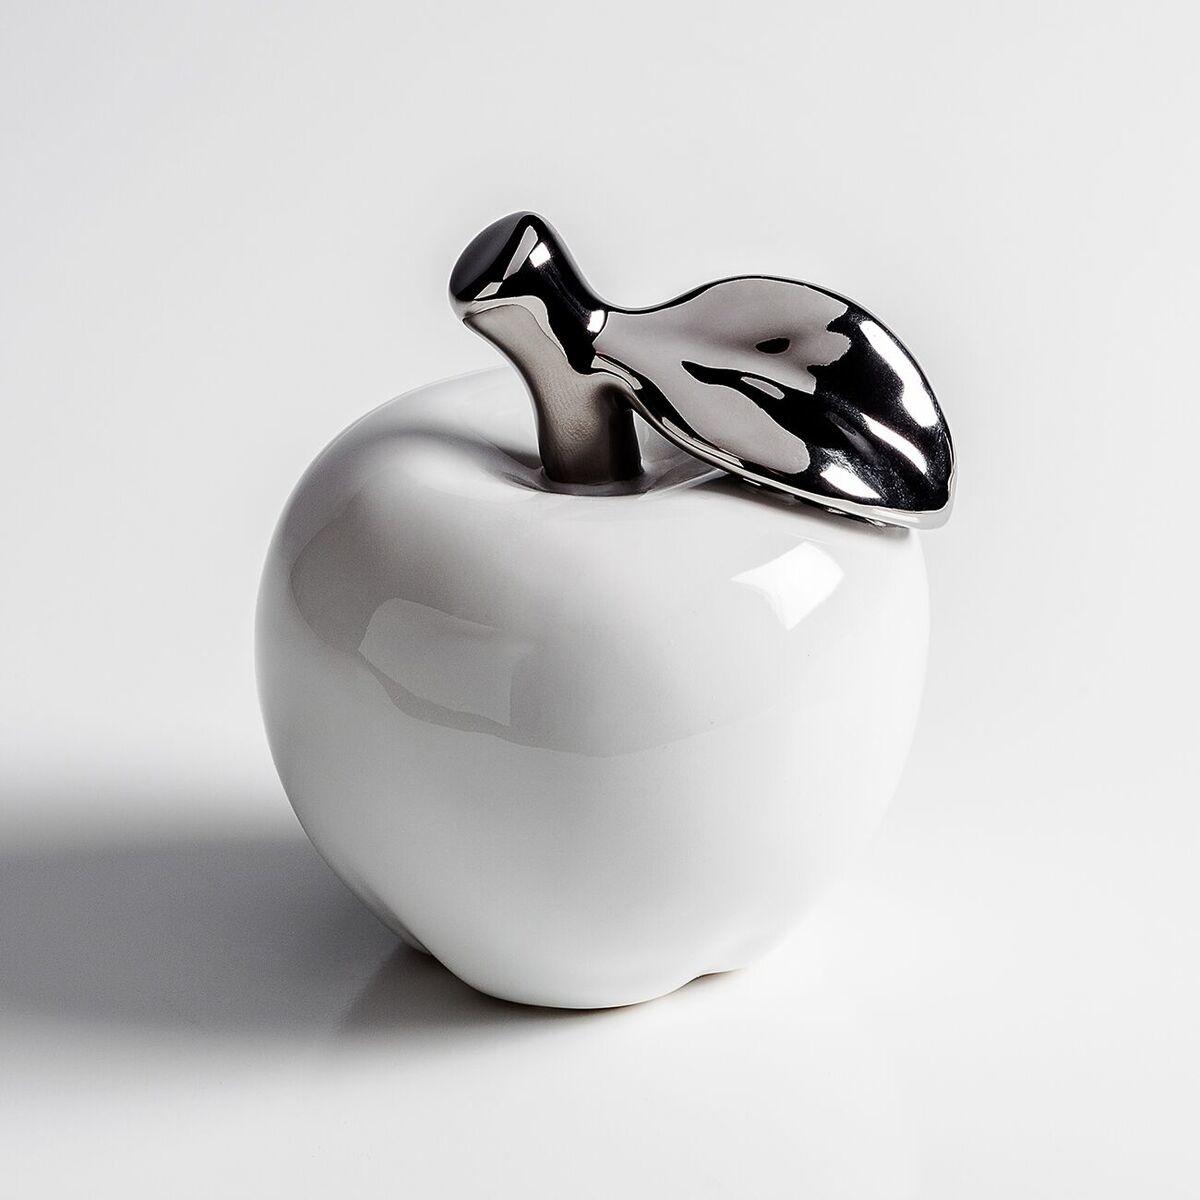 Torre & Tagus Ceramic Orchard Apple